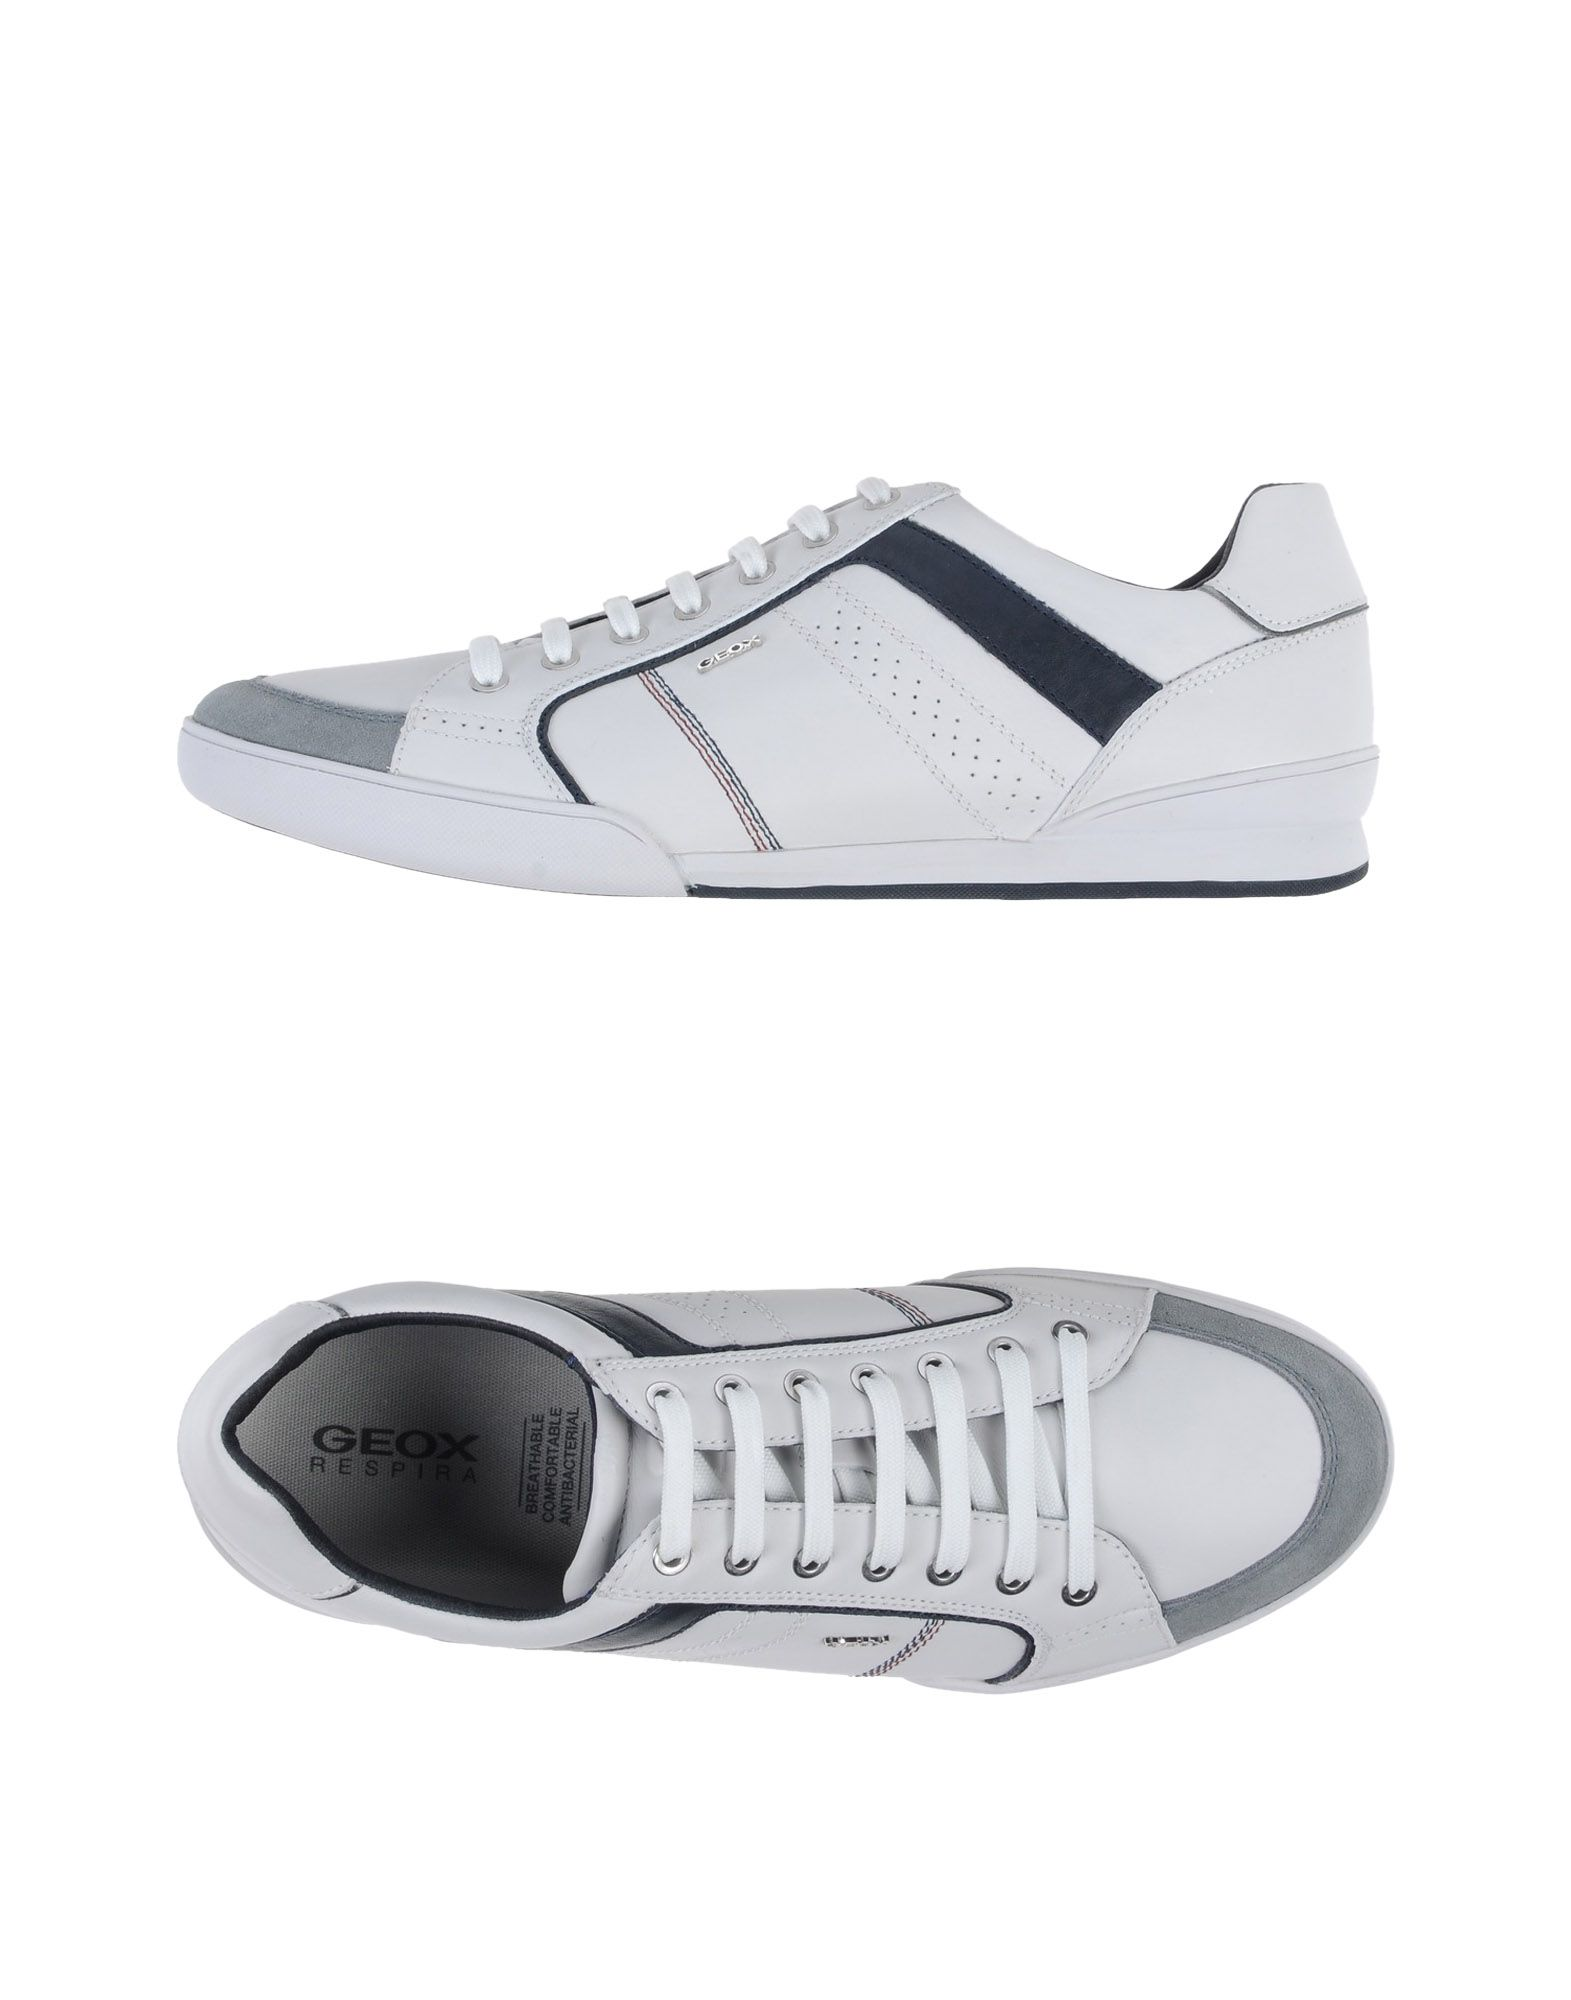 Geox Sneakers Herren  Schuhe 11198444GG Heiße Schuhe  0b2aae